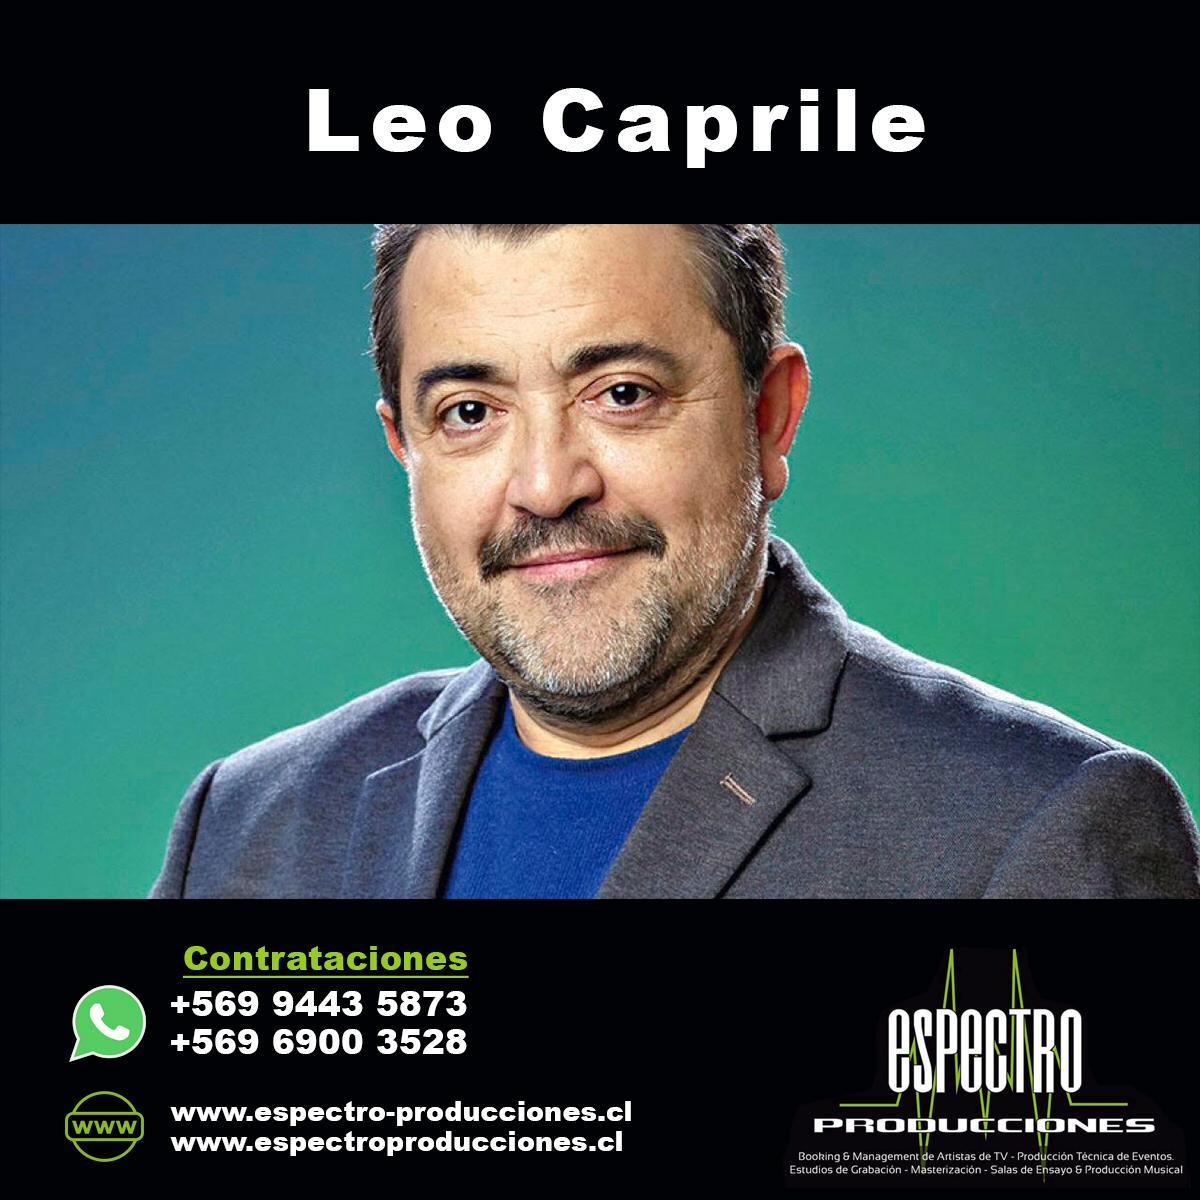 Leo Caprile